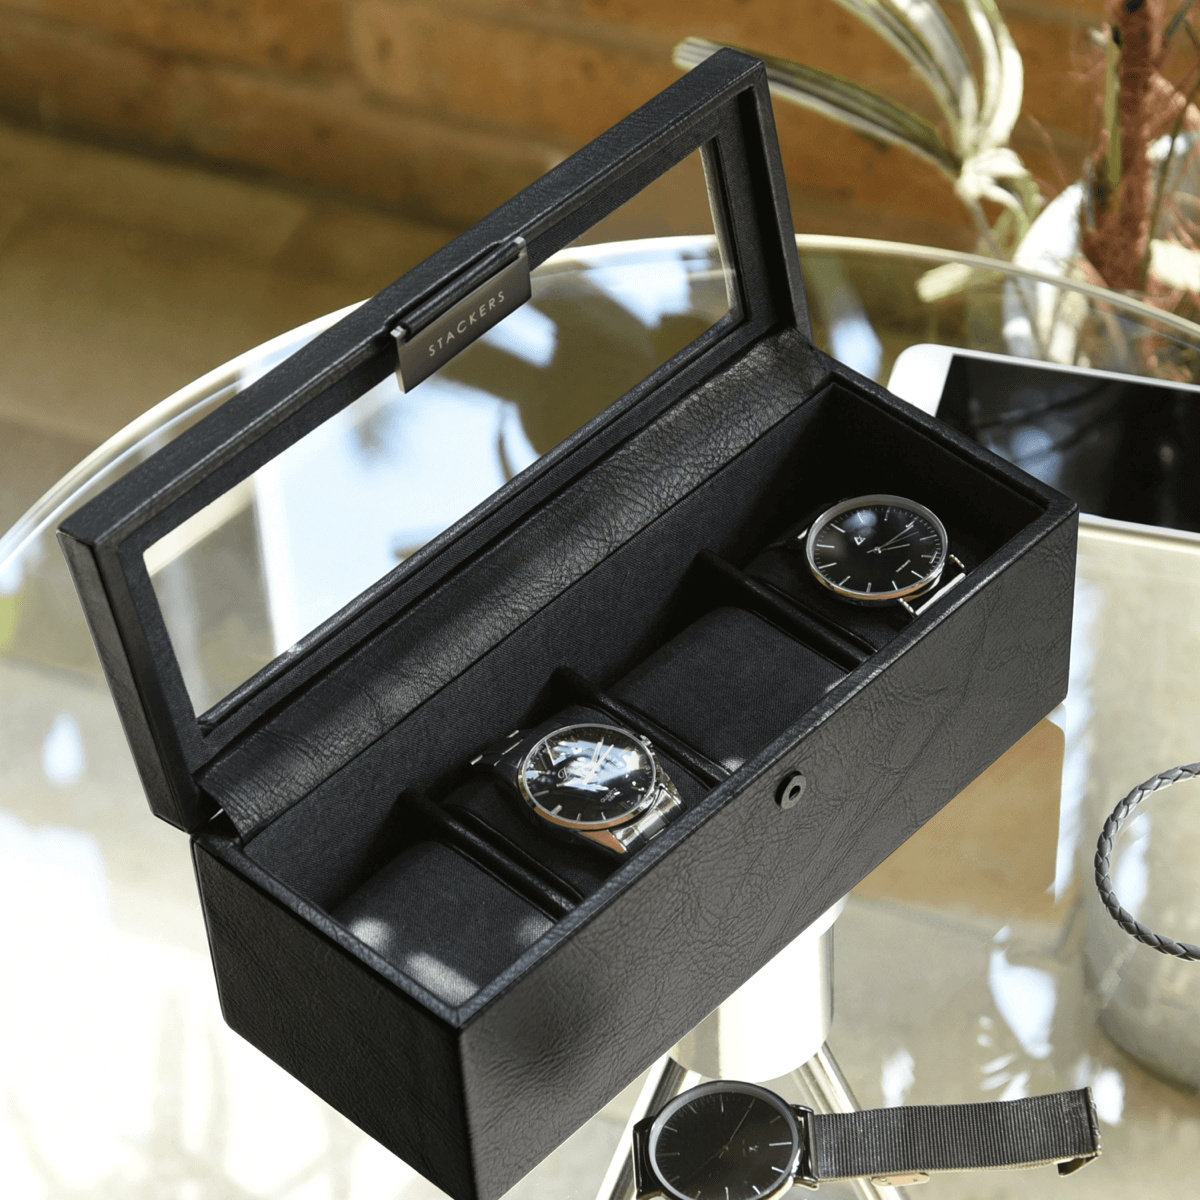 4-Watch Box Black-1